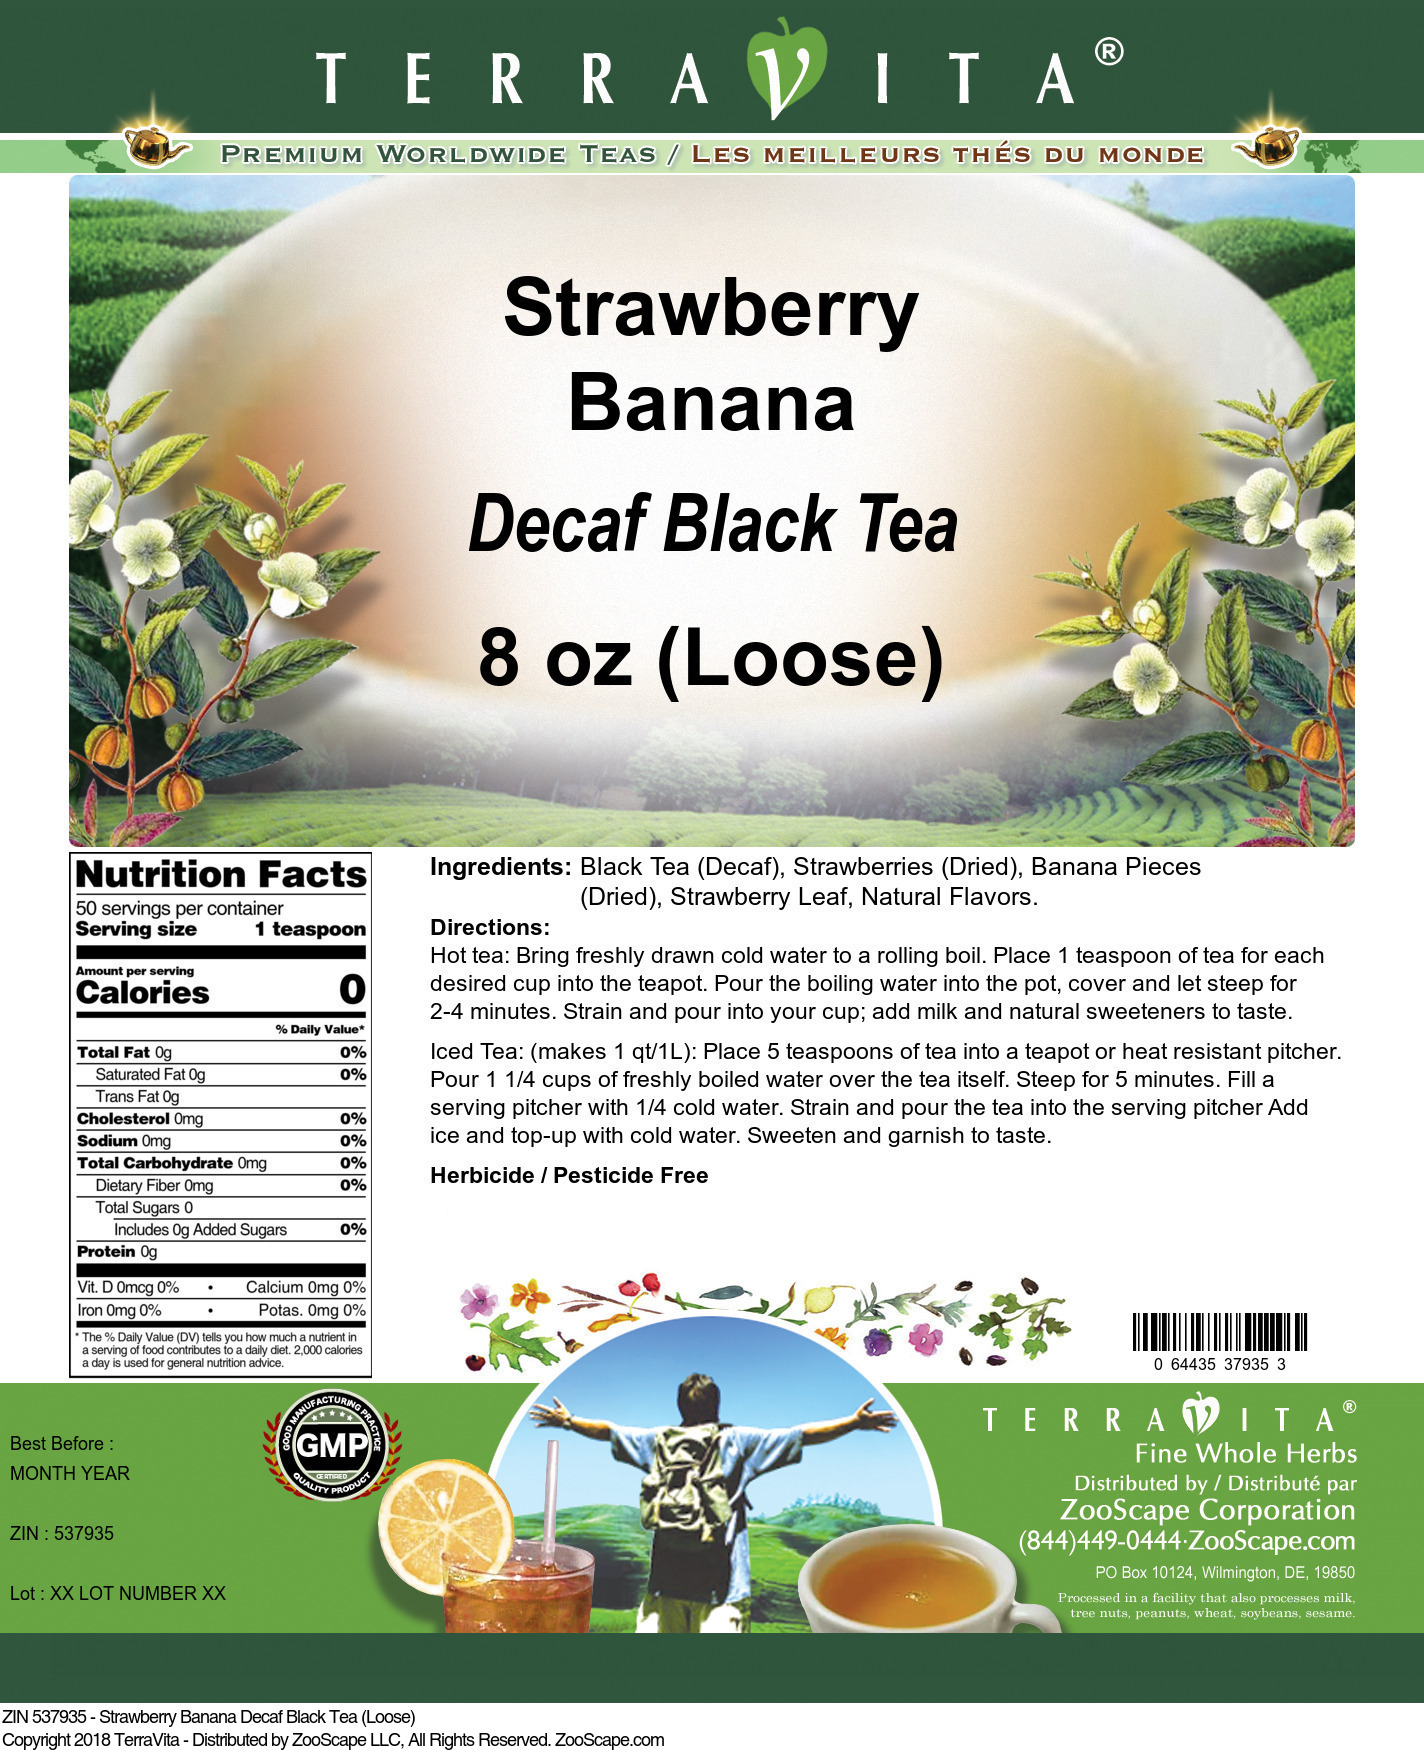 Strawberry Banana Decaf Black Tea